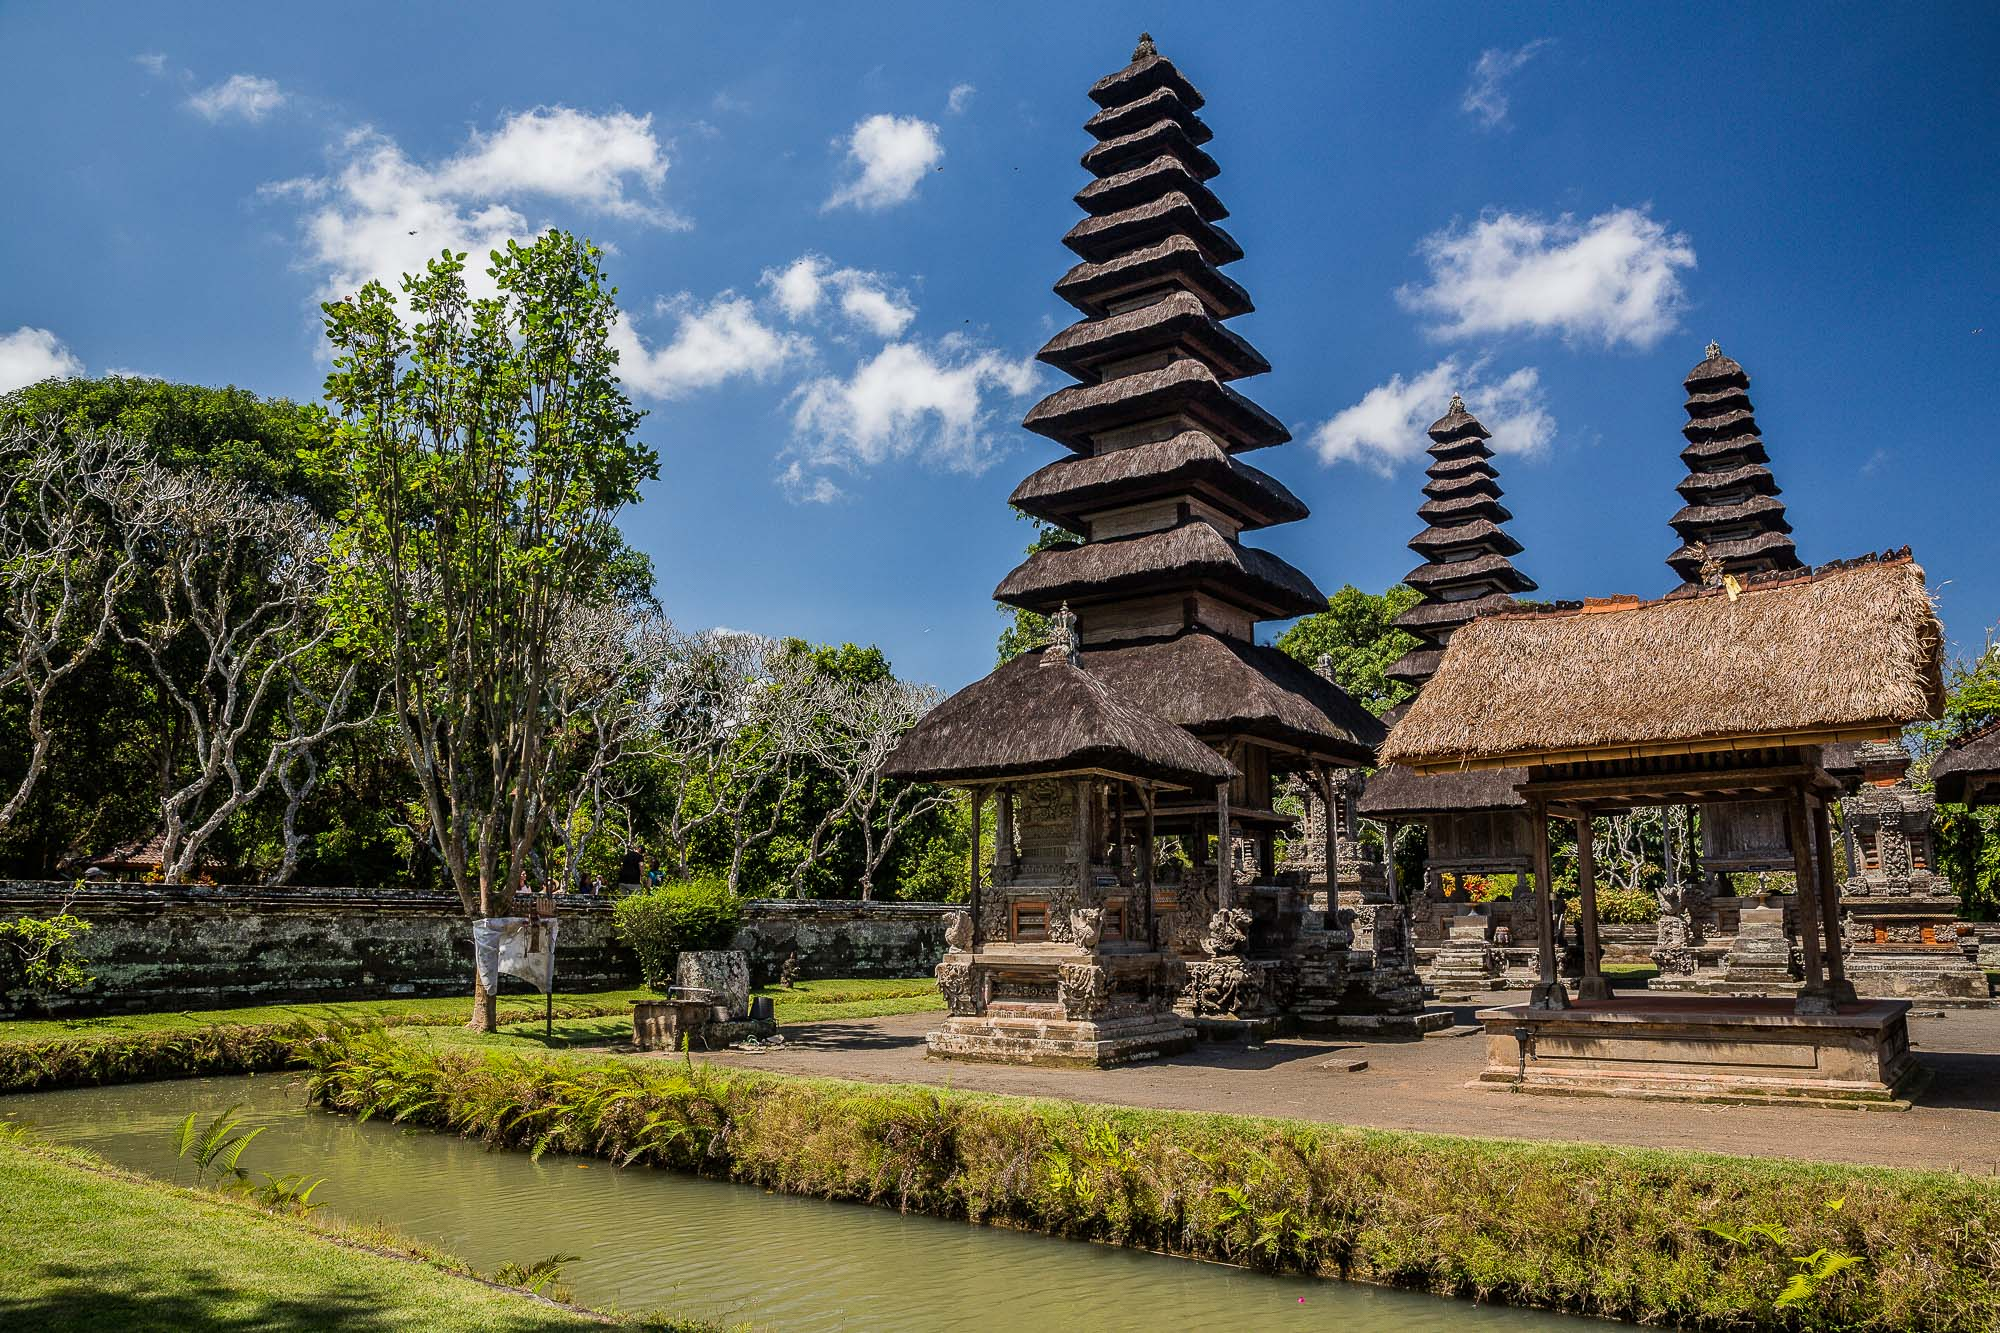 INDONESIA_2015_04 BALI_JusMedic_1182